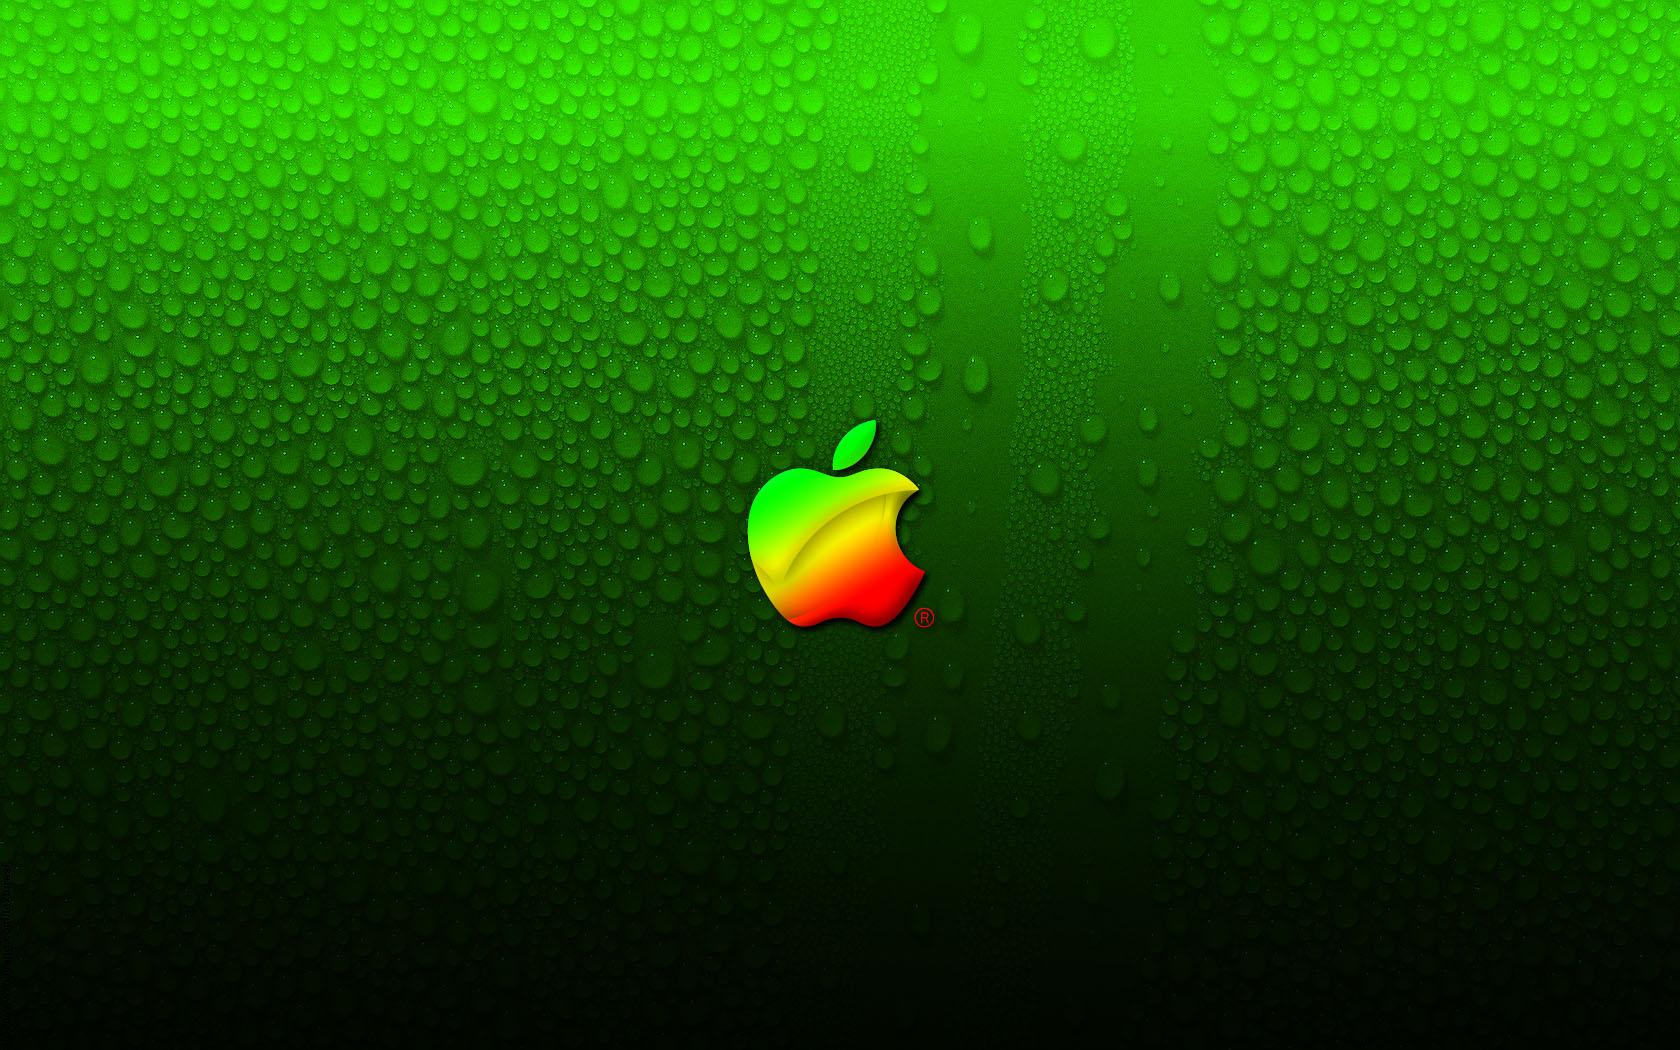 Apple Wallpaper Hd wallpaper - 1279588